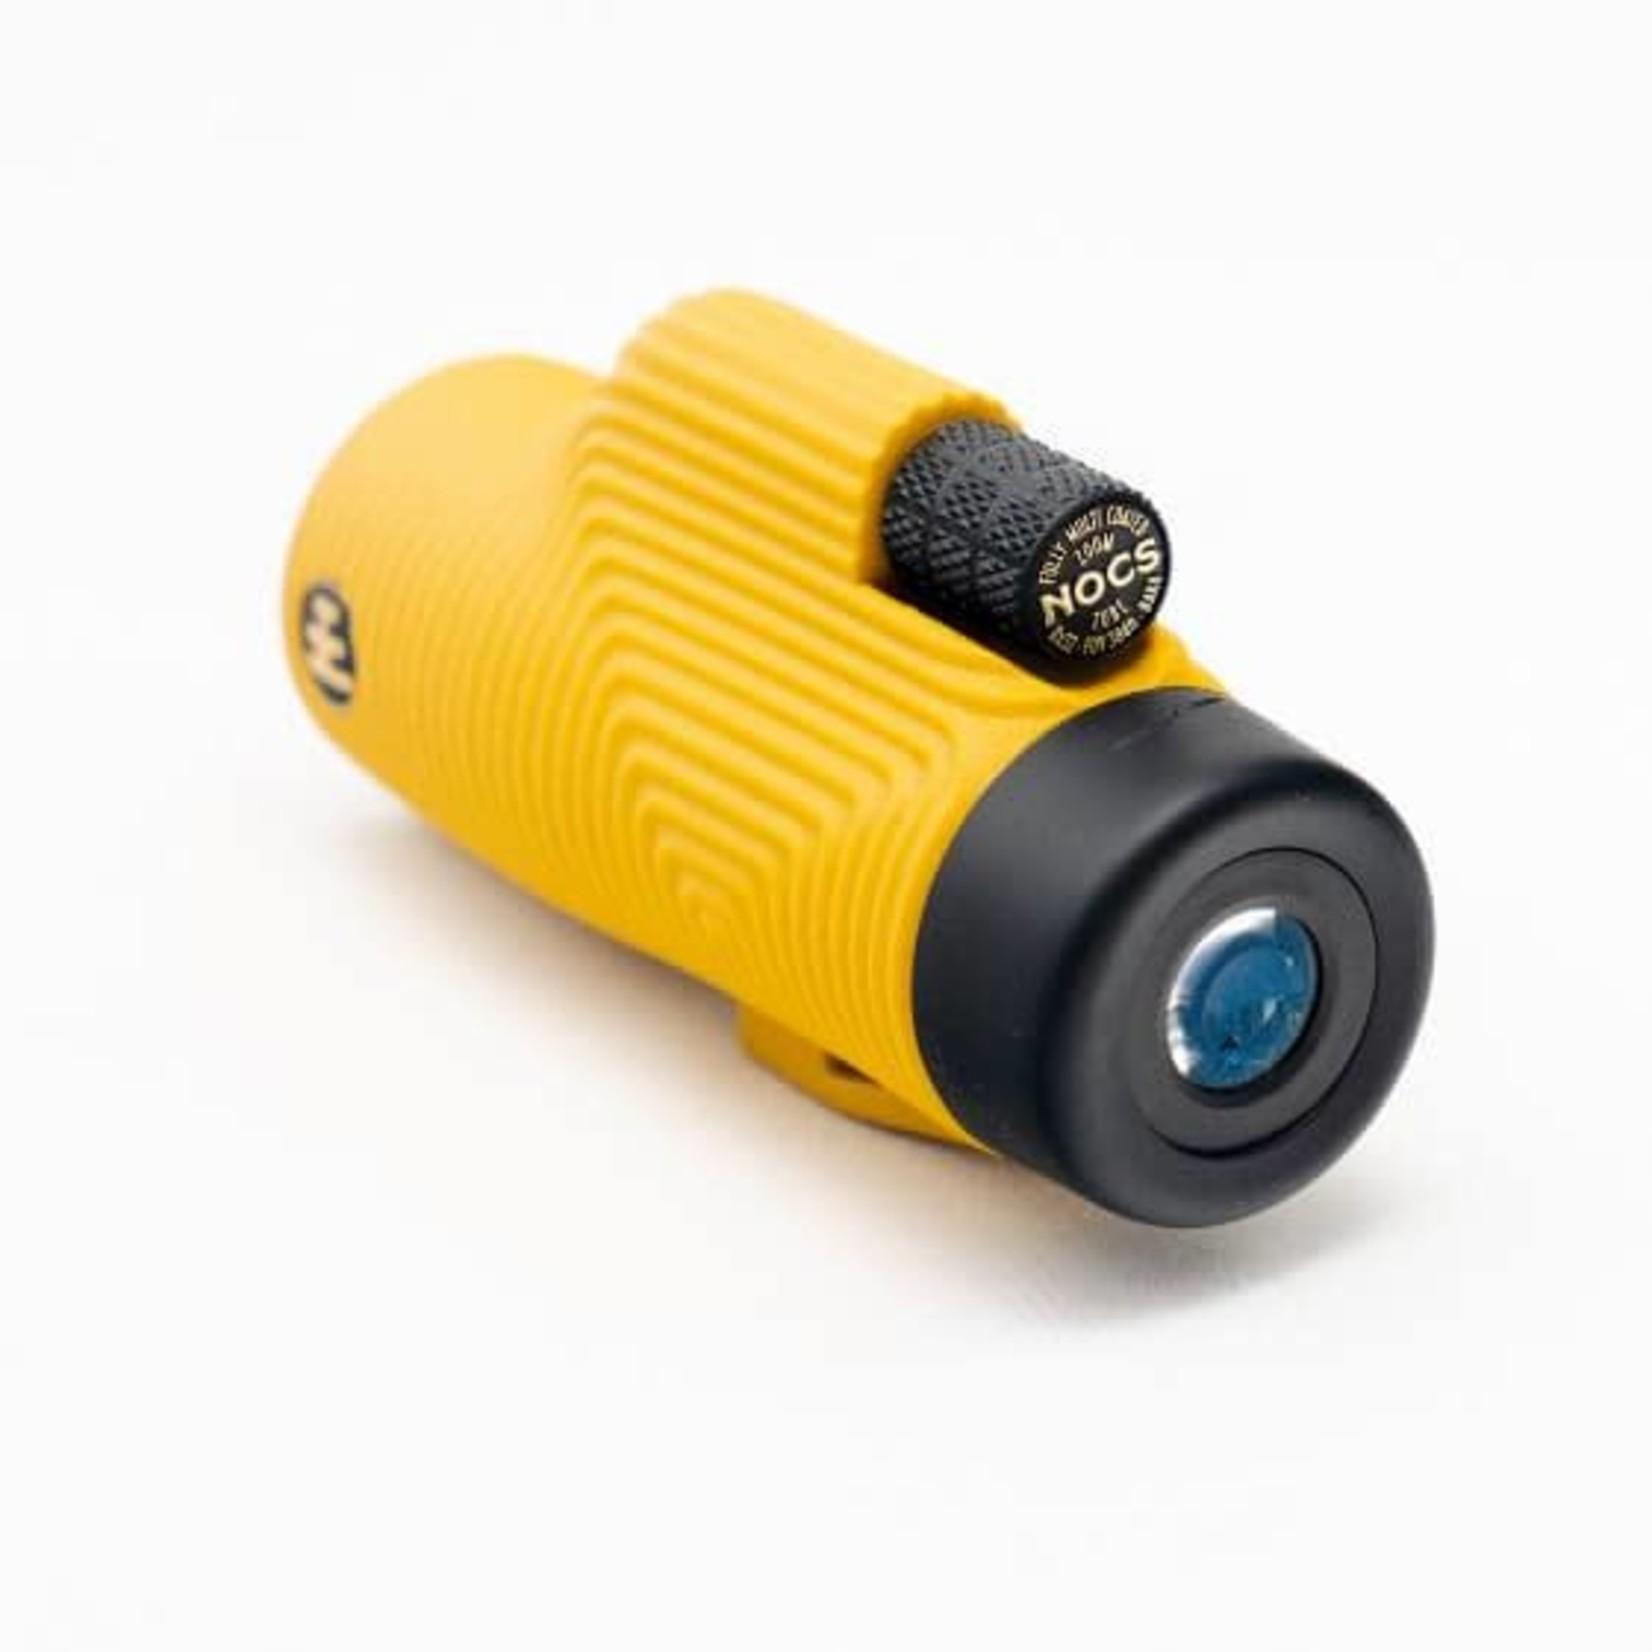 Nocs Provisions Nocs Monocular Zoom Tube Telescope